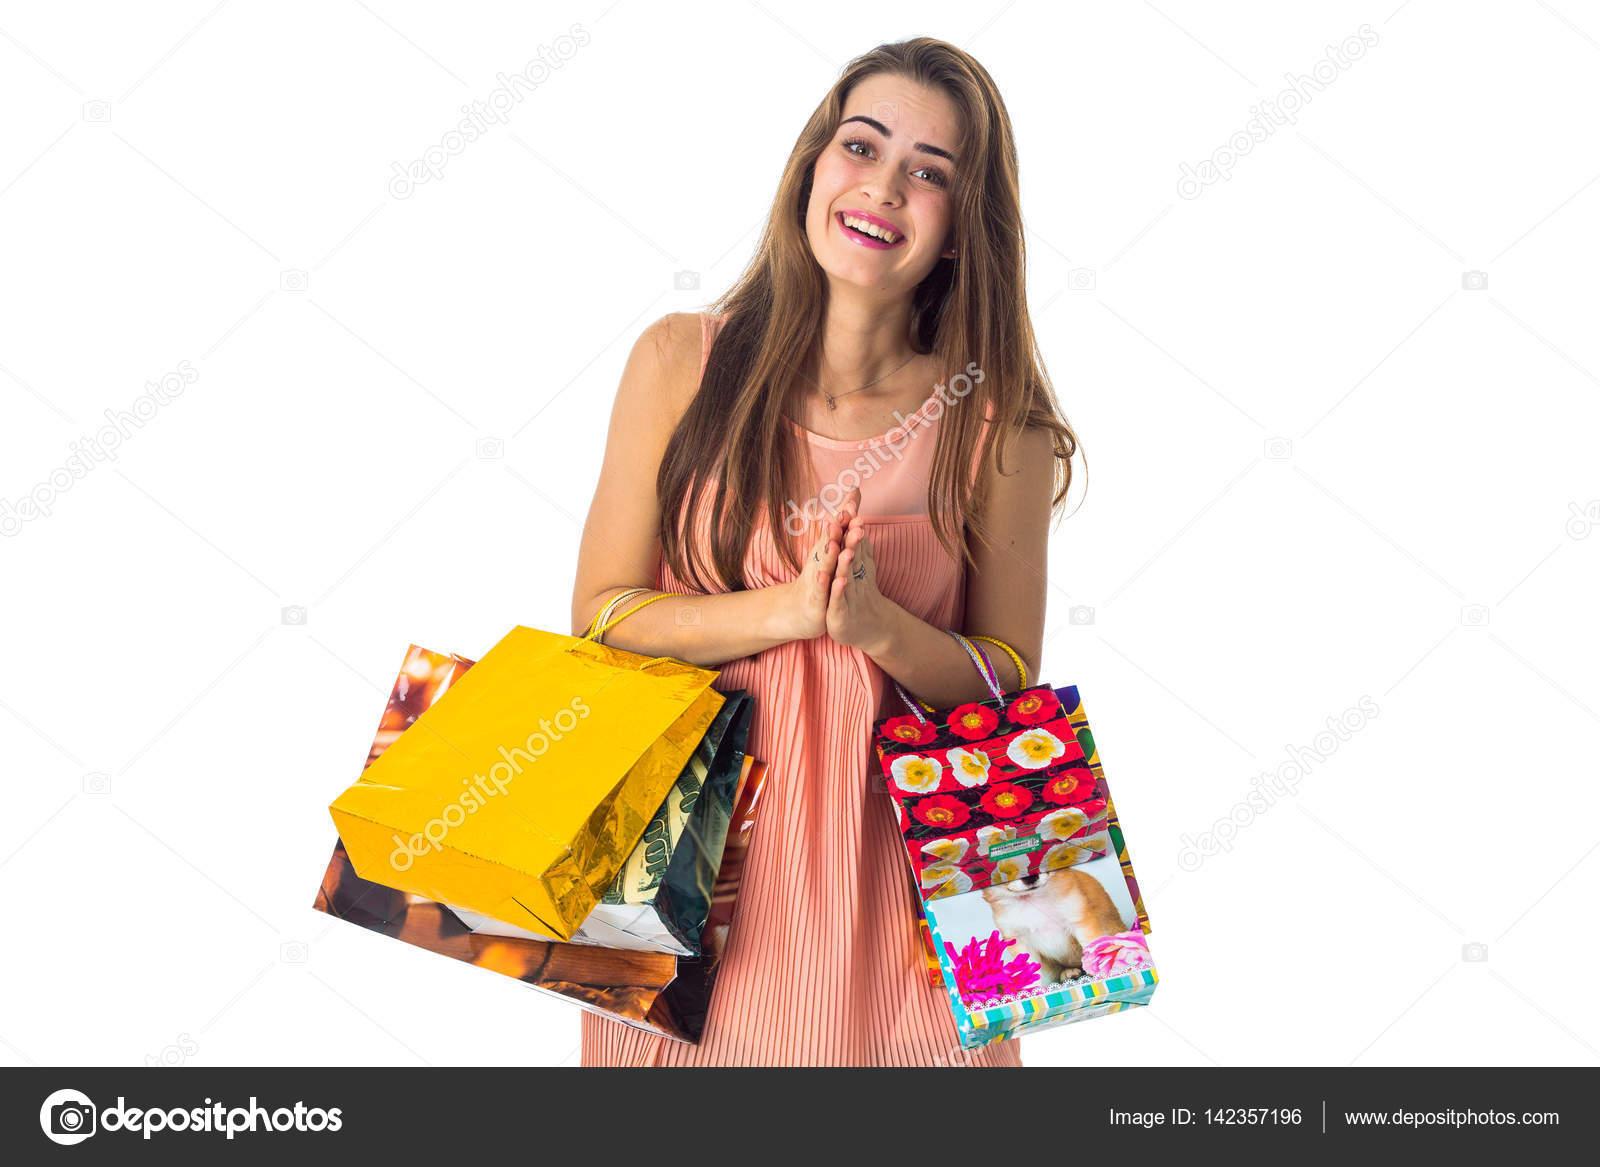 d4e1cf15e12e Αστείο κορίτσι κατέχει πολλά φωτεινά ψώνια πακέτα που απομονώνονται σε  λευκό φόντο– εικόνα αρχείου